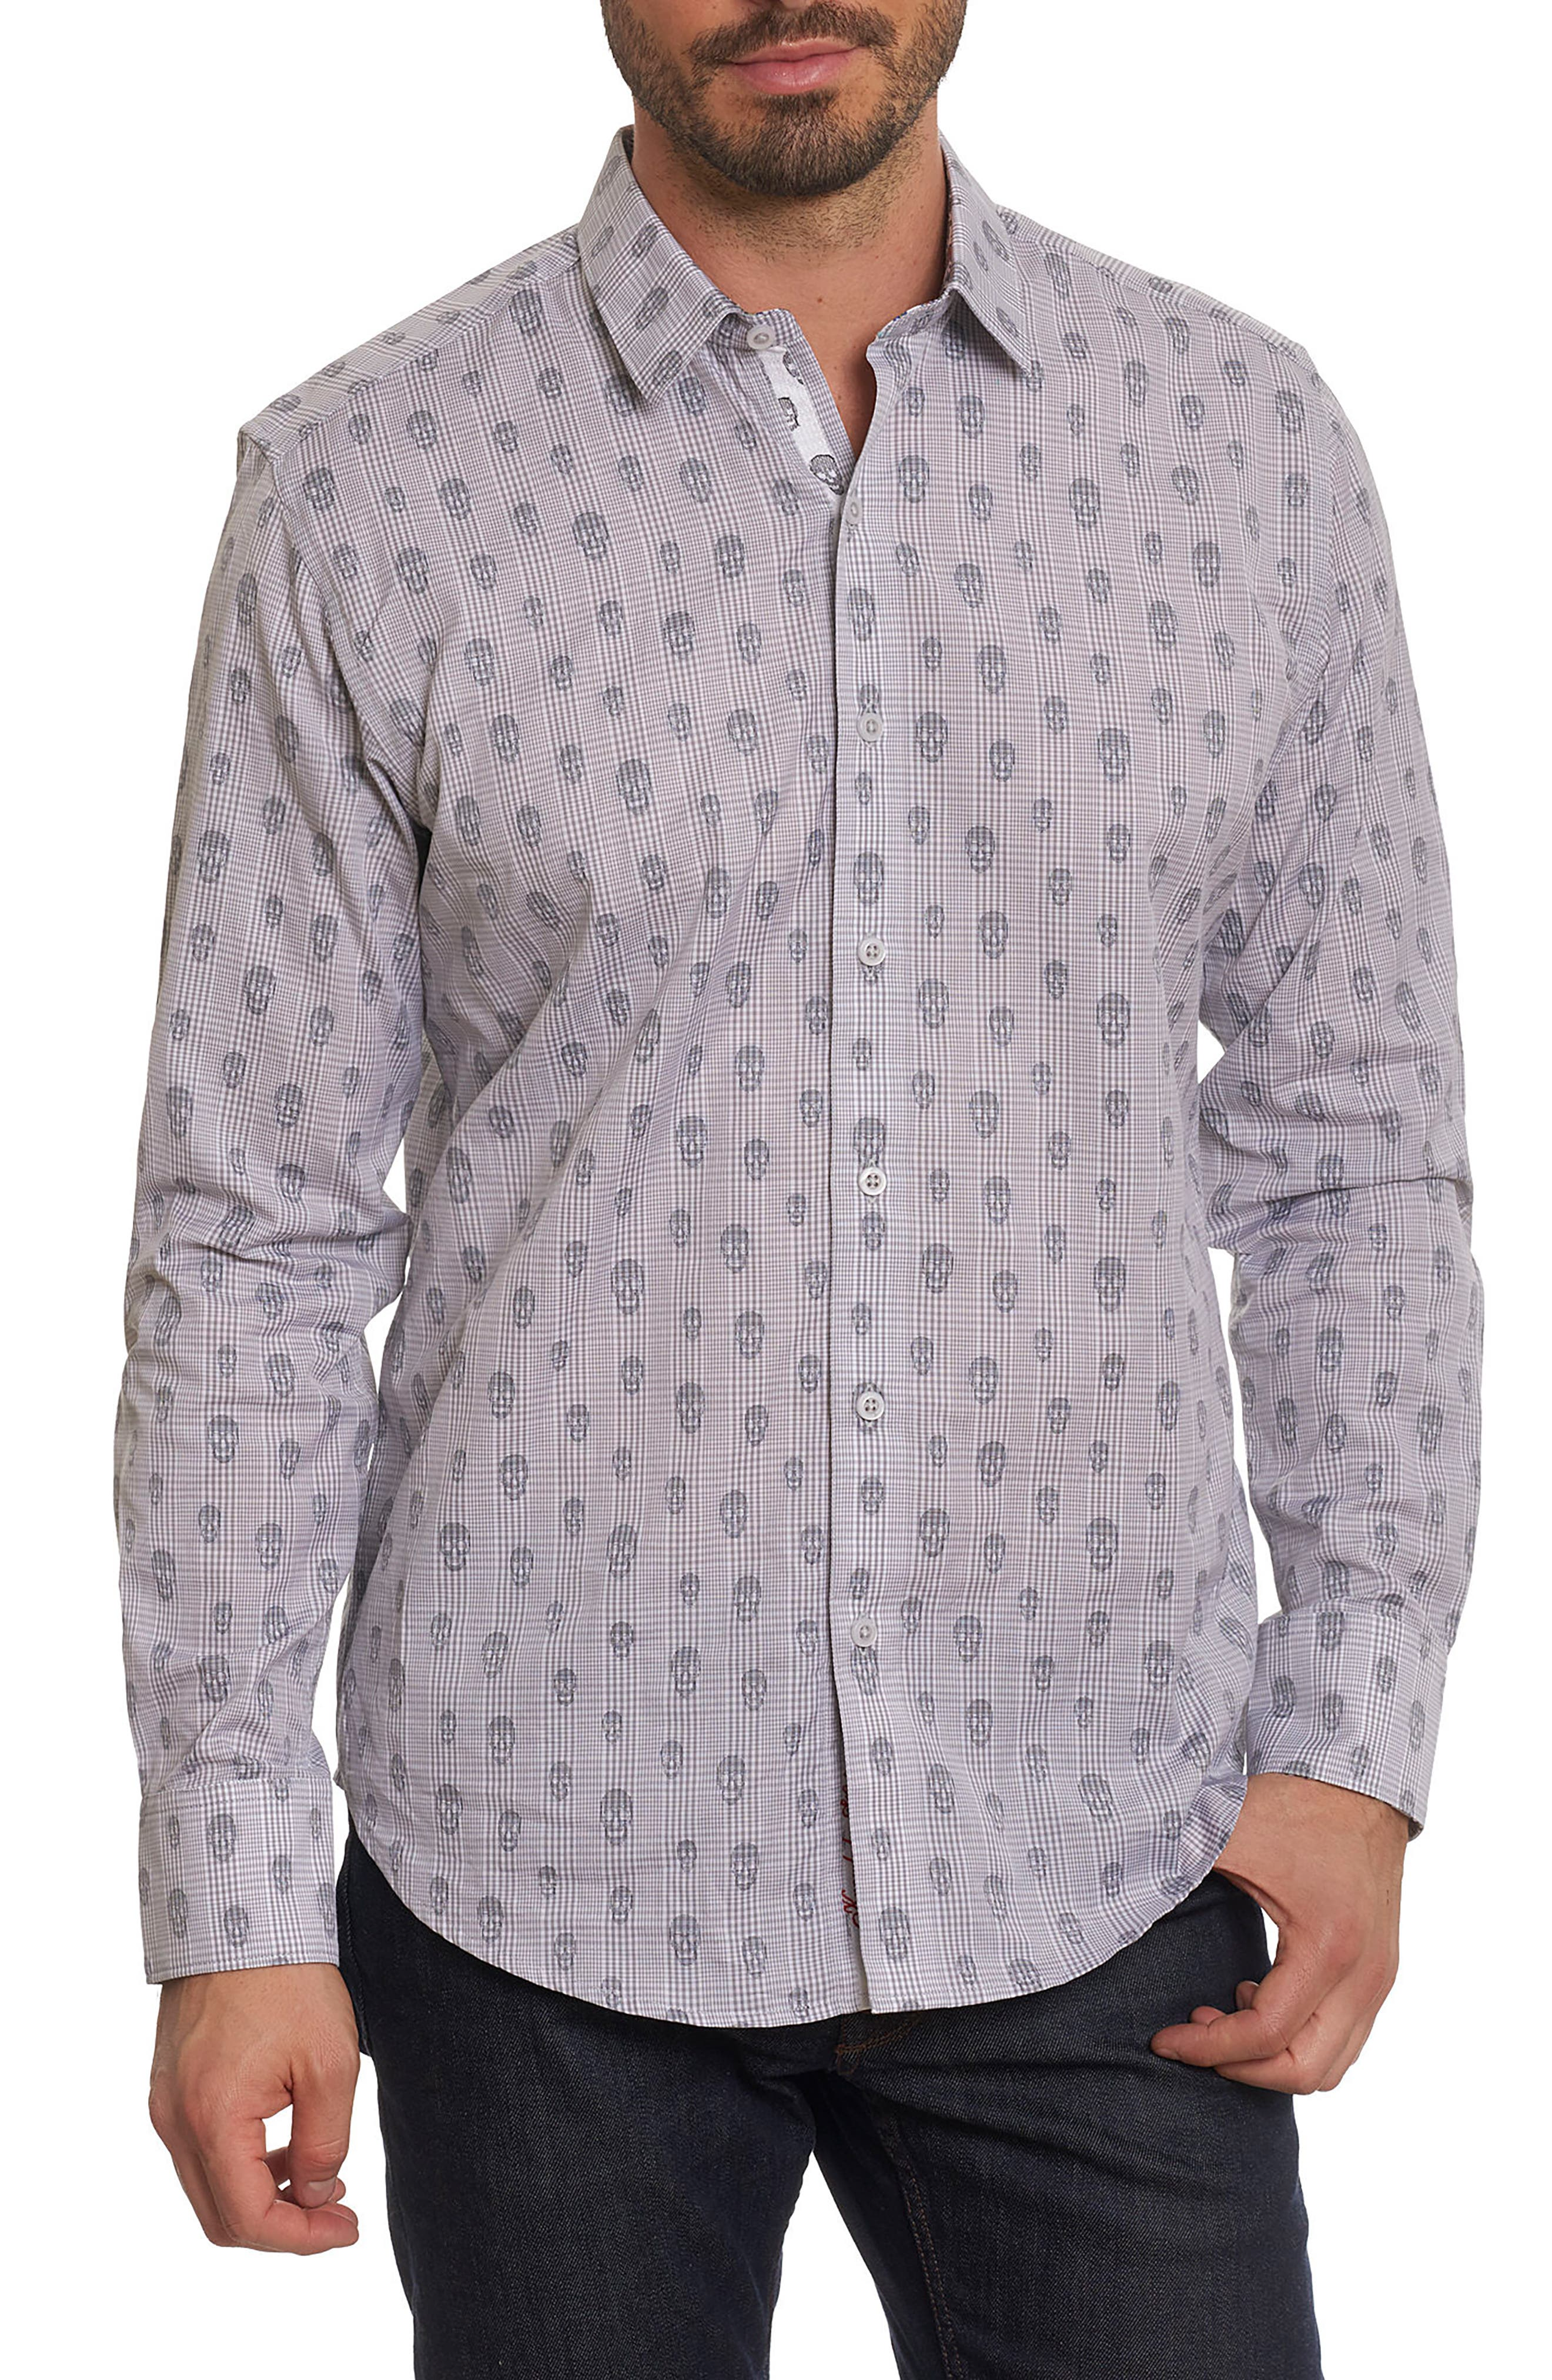 Kinderhook Classic Fit Skull Check Sport Shirt,                         Main,                         color, 020